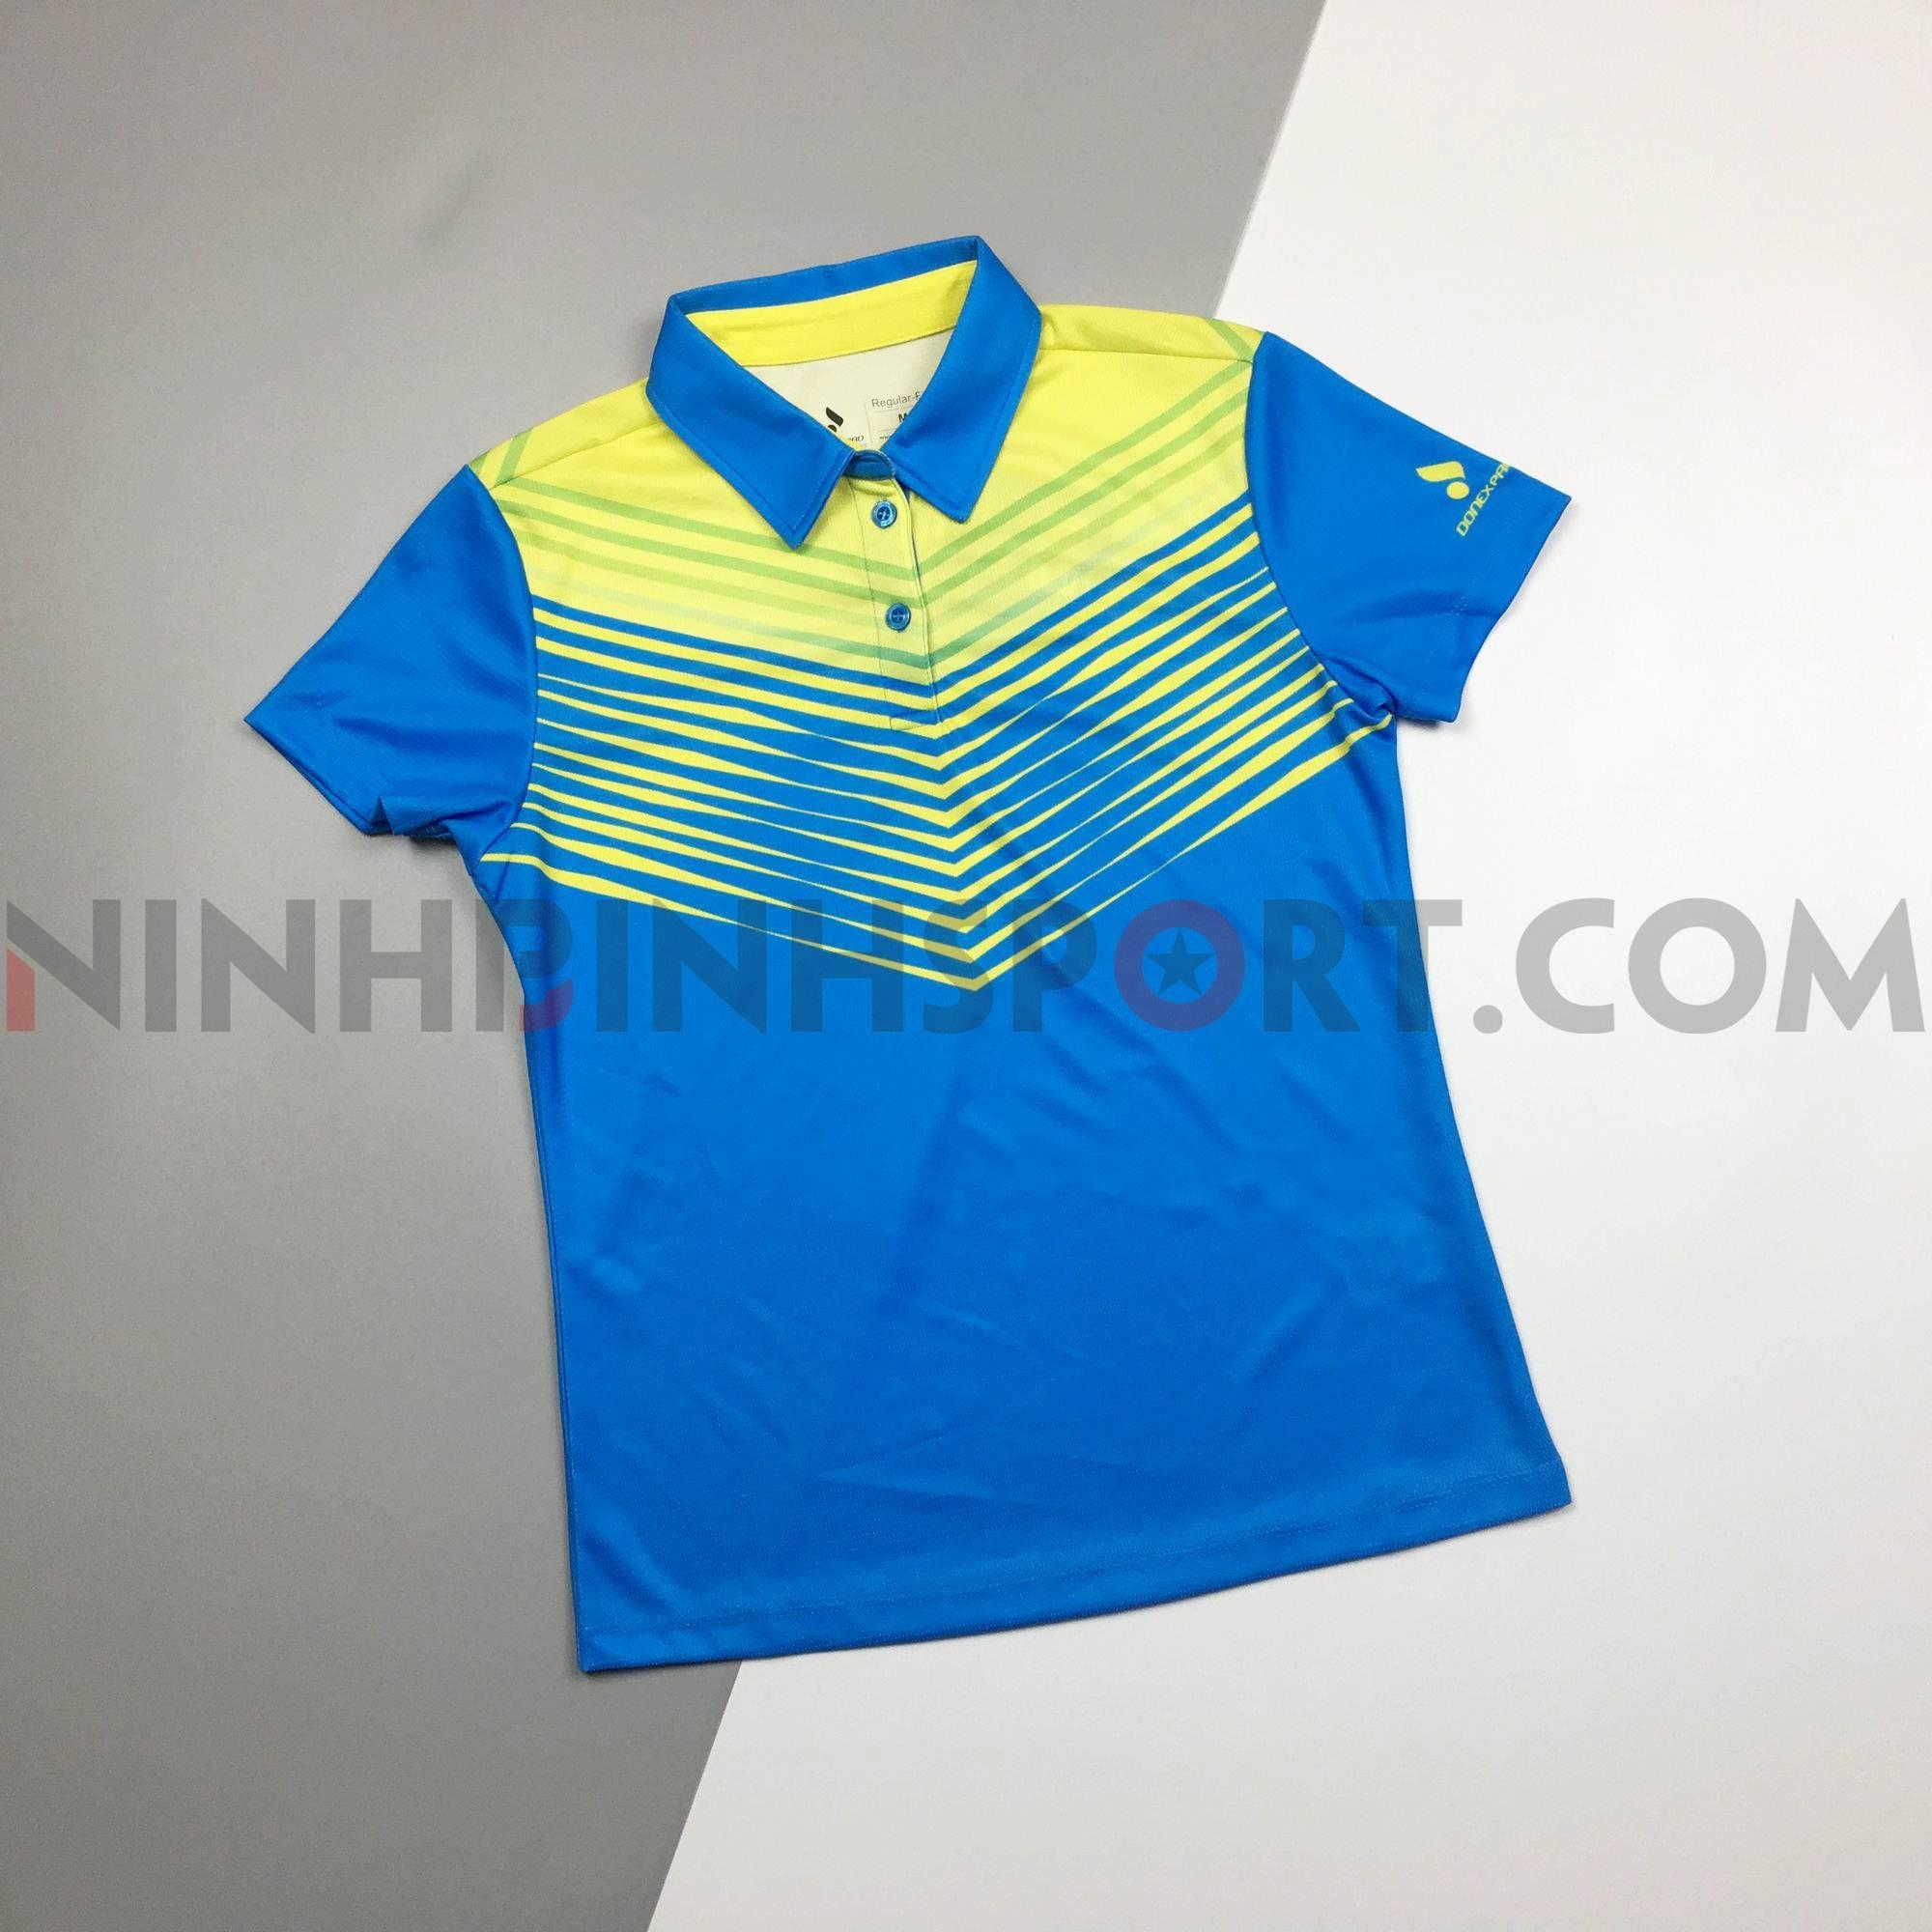 Áo thể thao nữ Donex Polo AC-3398-02-06